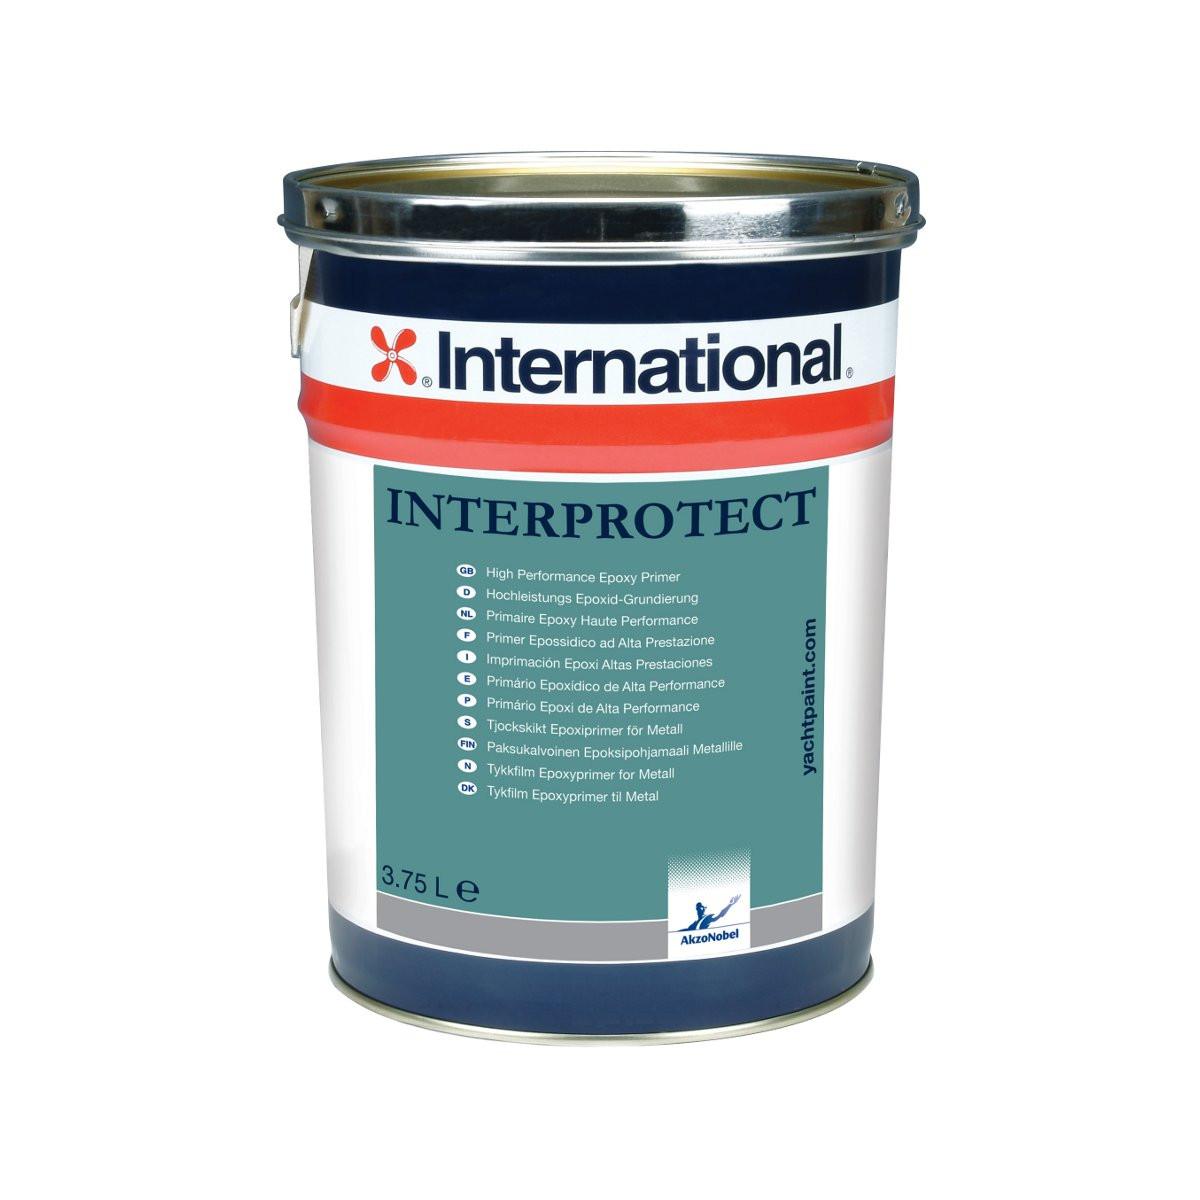 International Interprotect primer - grau 5000ml